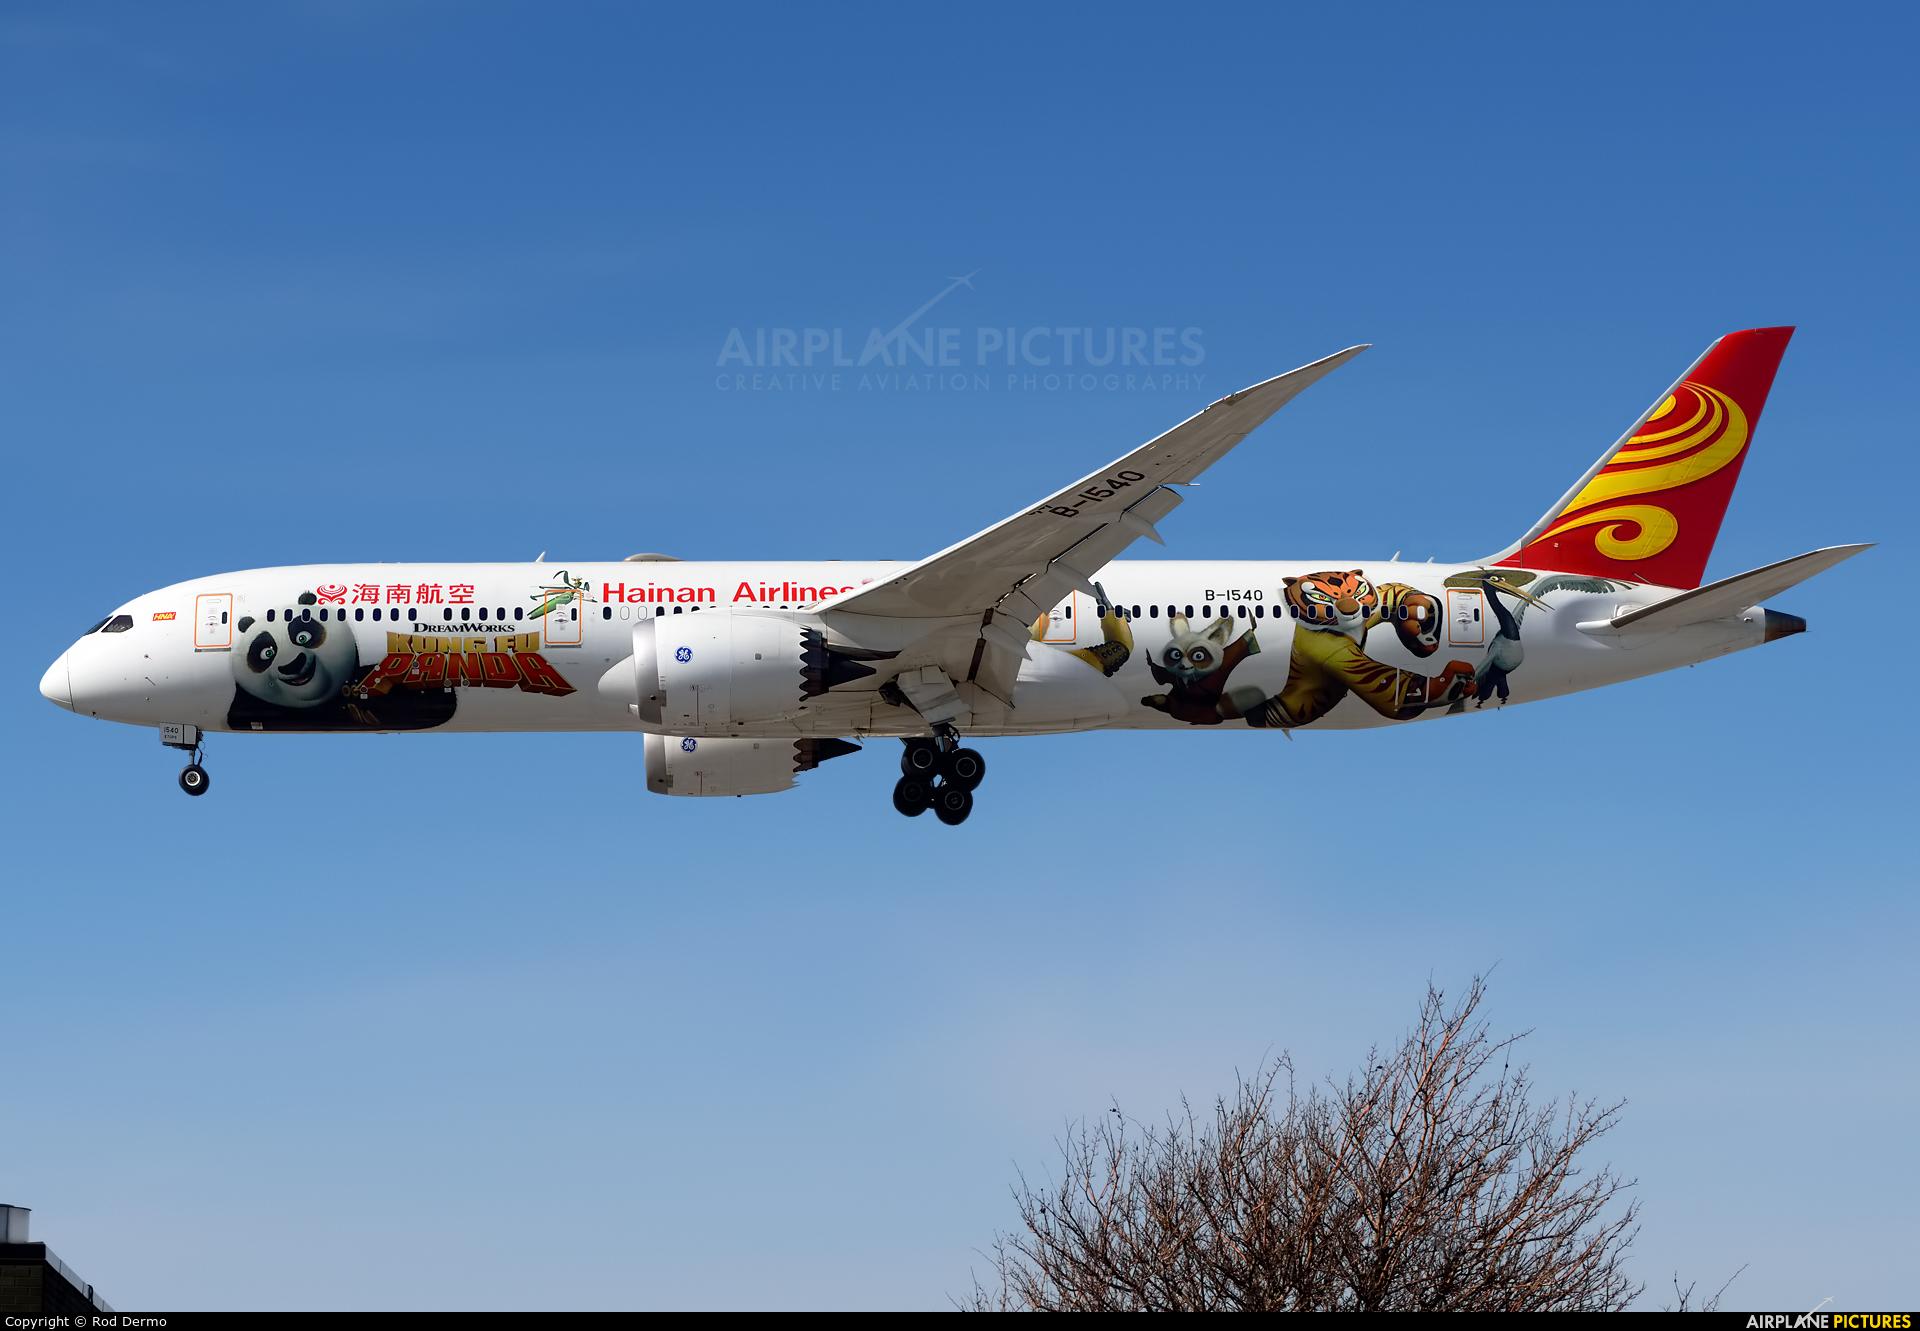 Hainan Airlines B-1540 aircraft at Toronto - Pearson Intl, ON